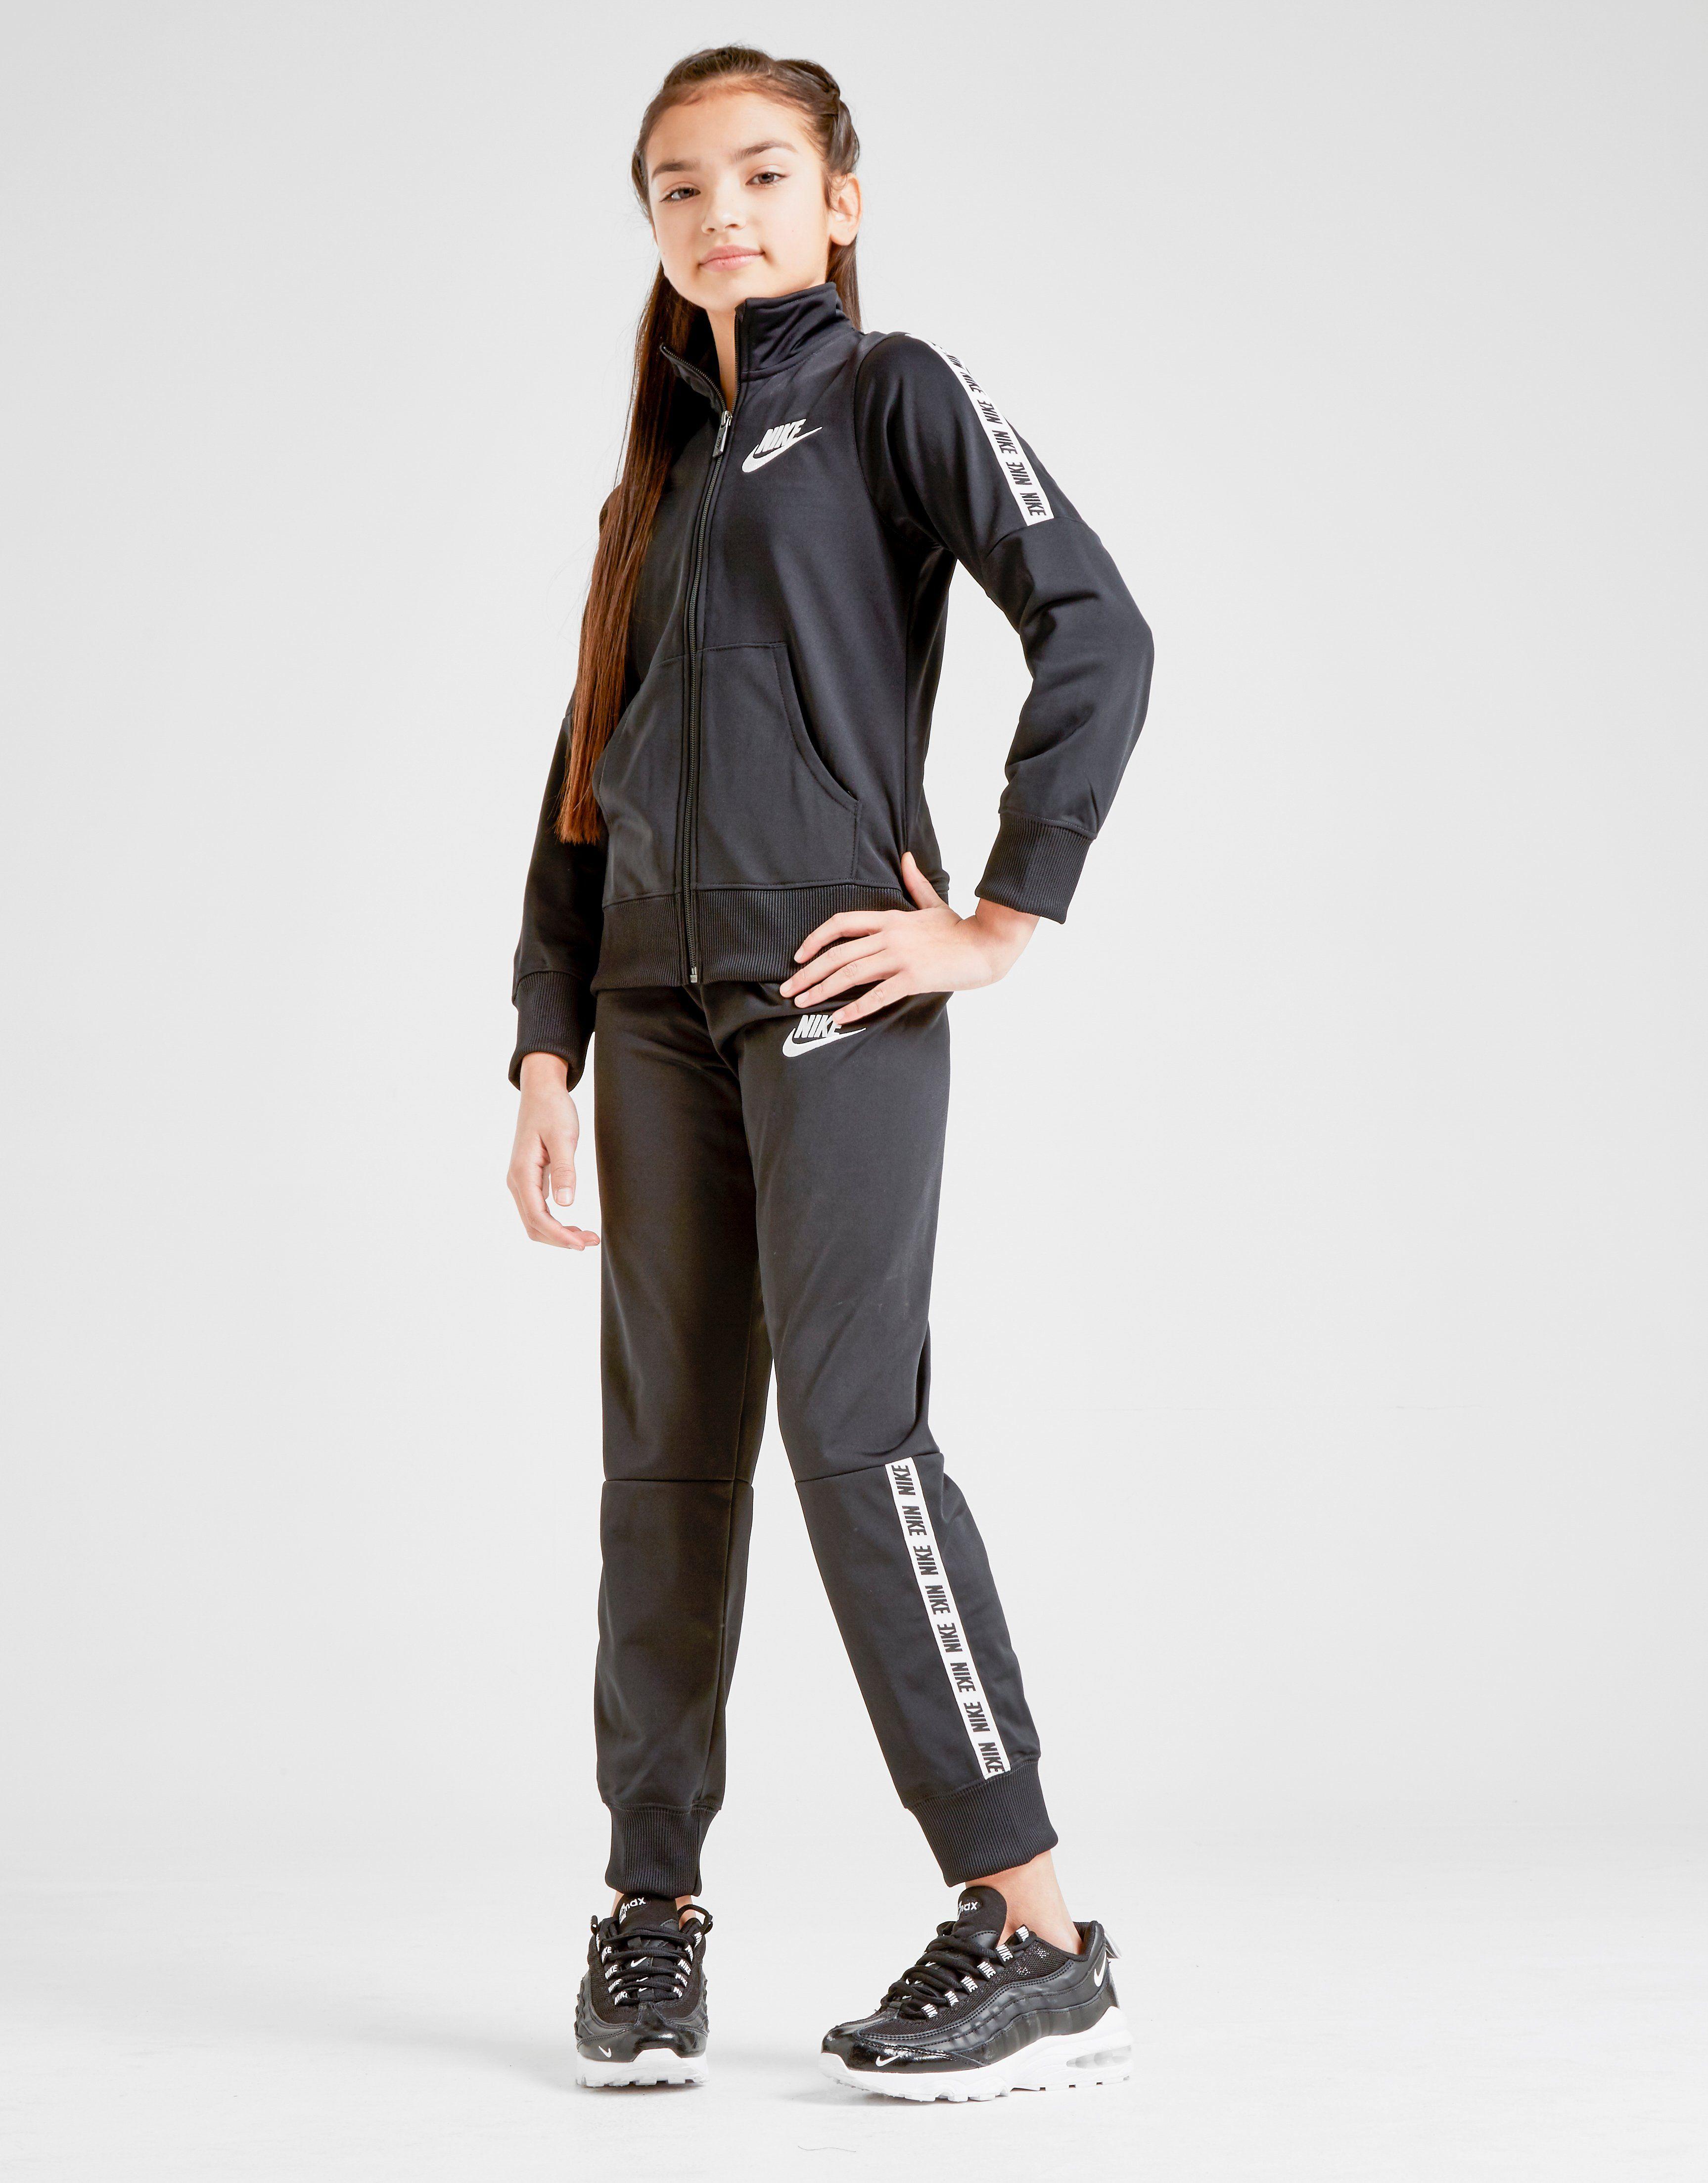 Nike Survêtement Girls' Poly Tape Junior